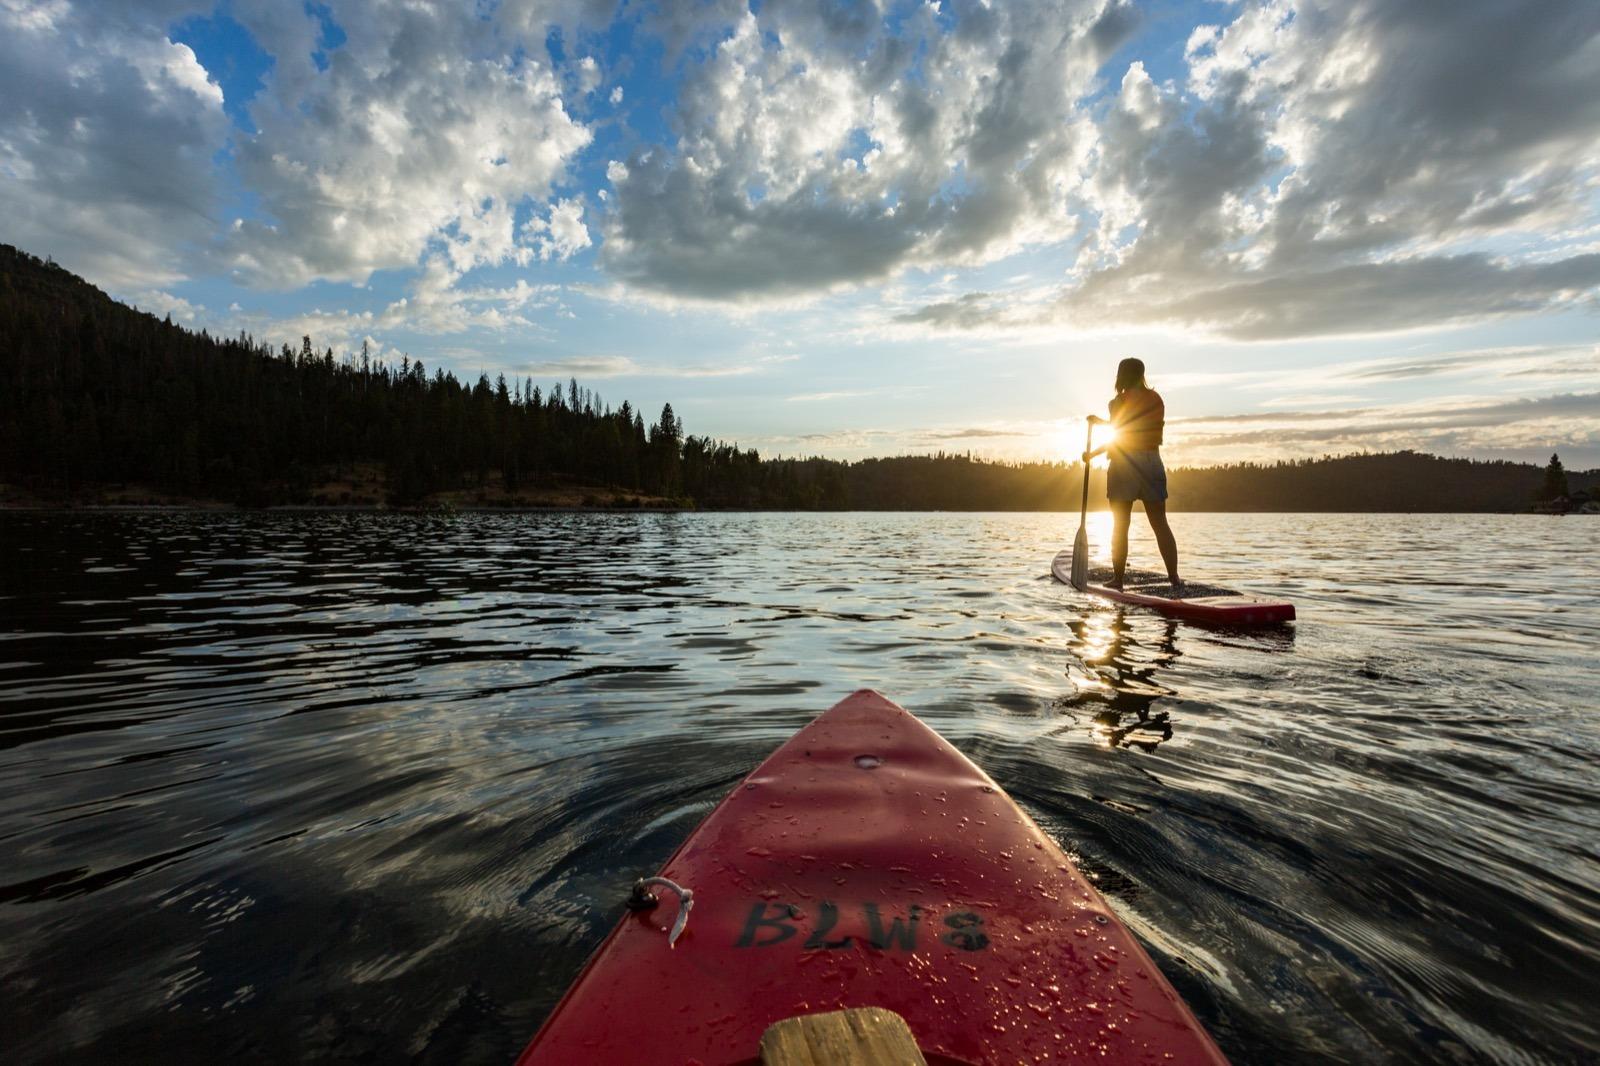 california-road-trip-high-sierra-madera-bass-lake-stand-up-paddle-sup-sunset-3